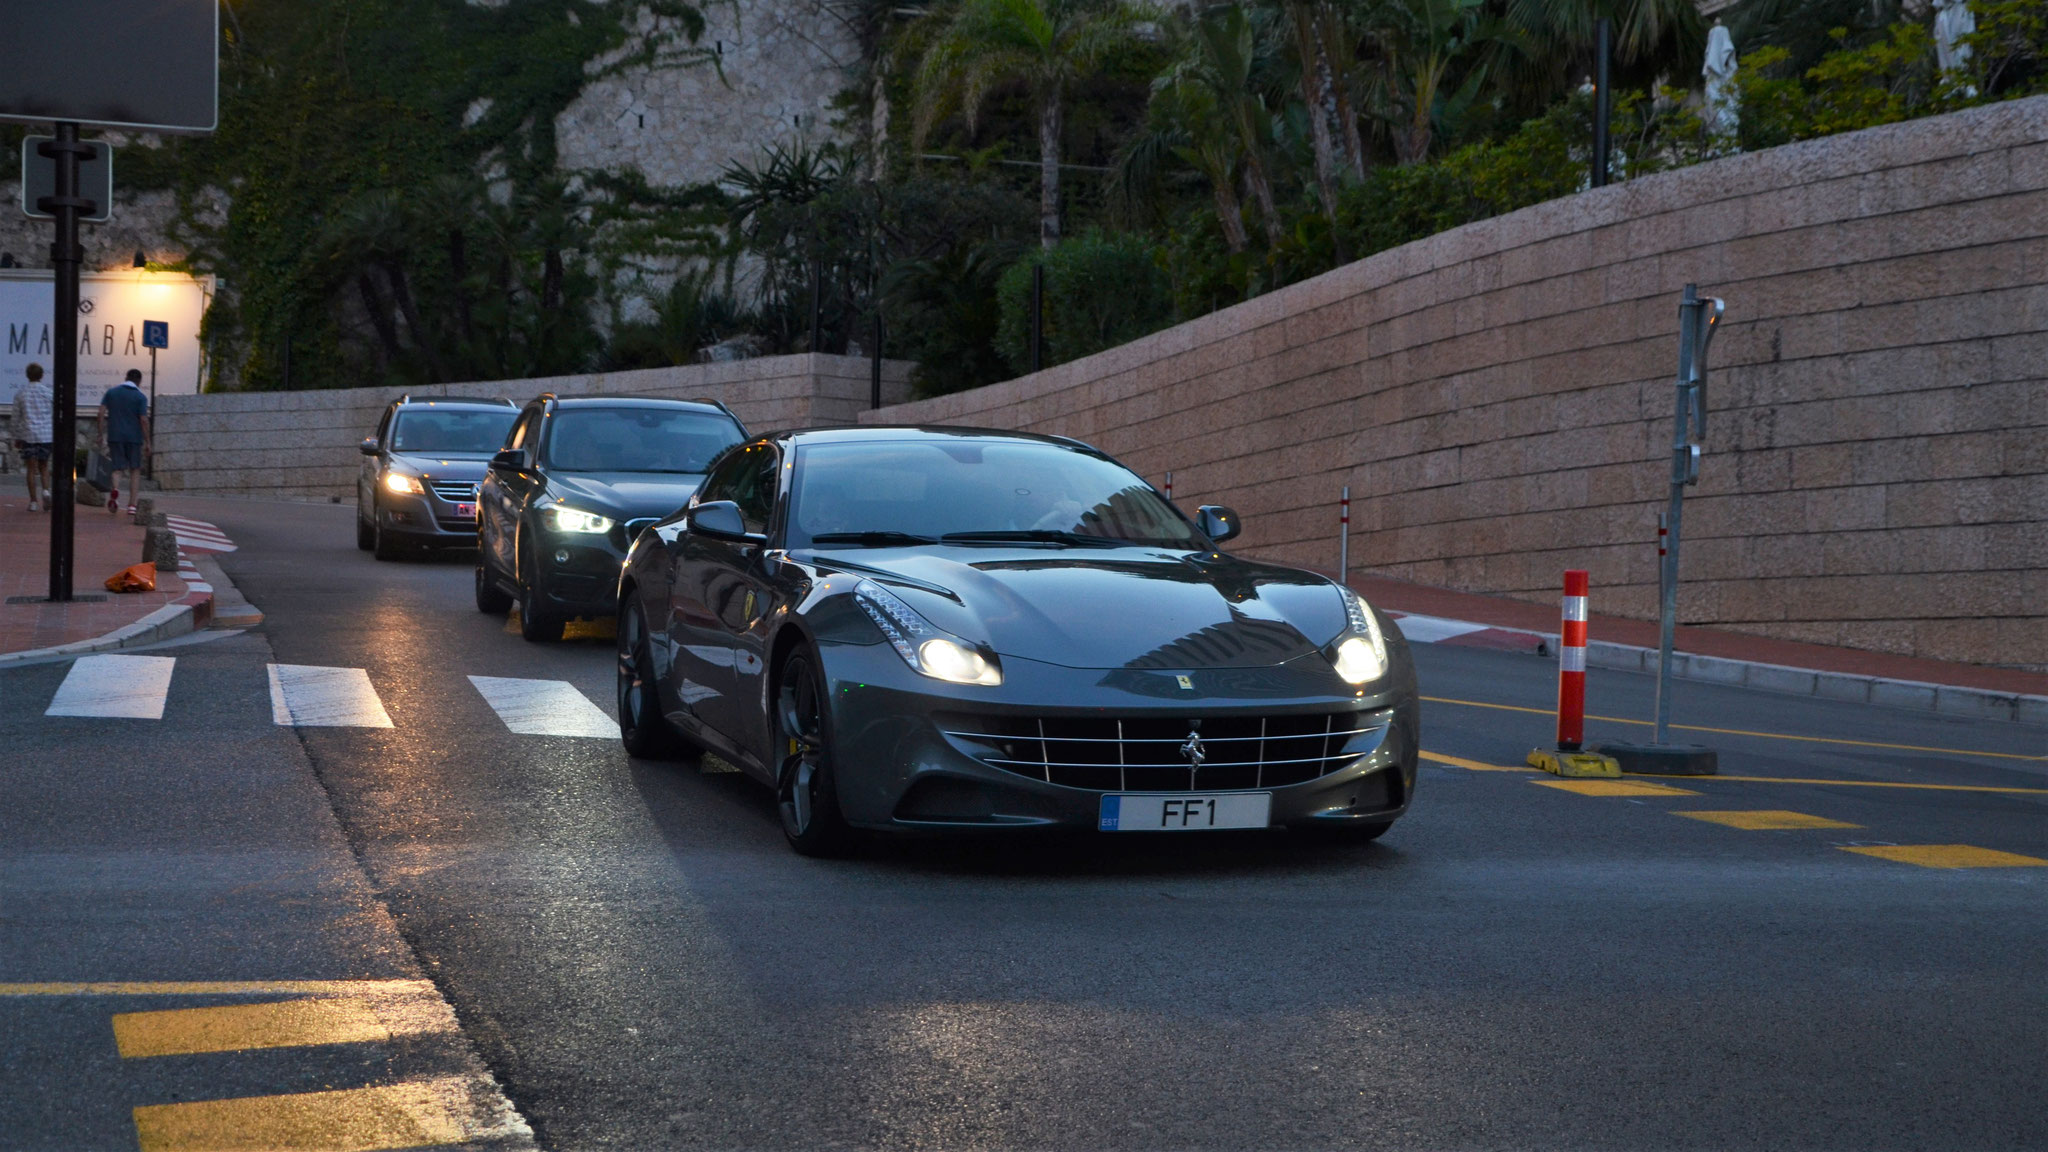 Ferrari FF - FF1 (EST)